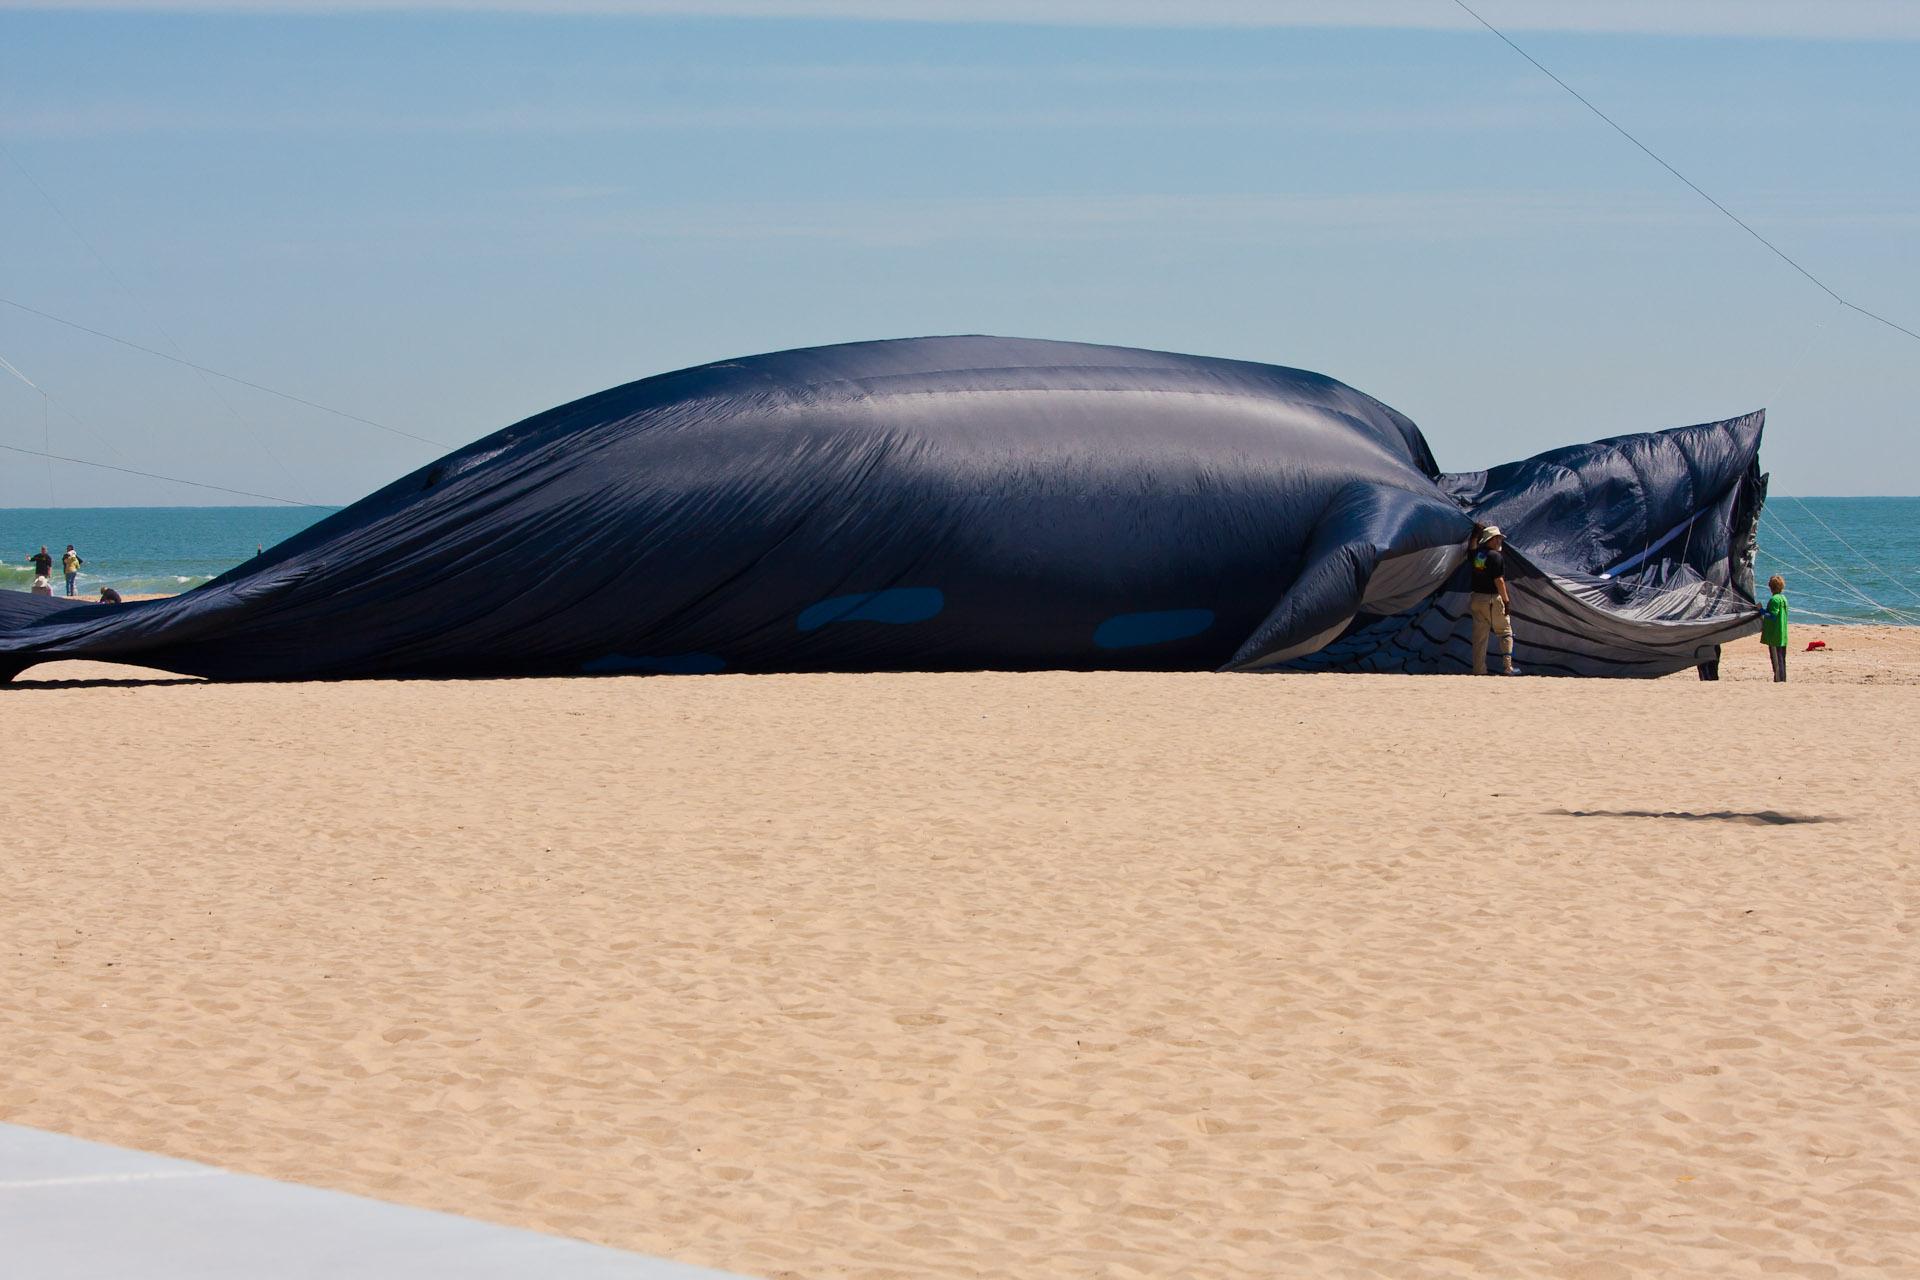 Blue whale size comparison to human - photo#12